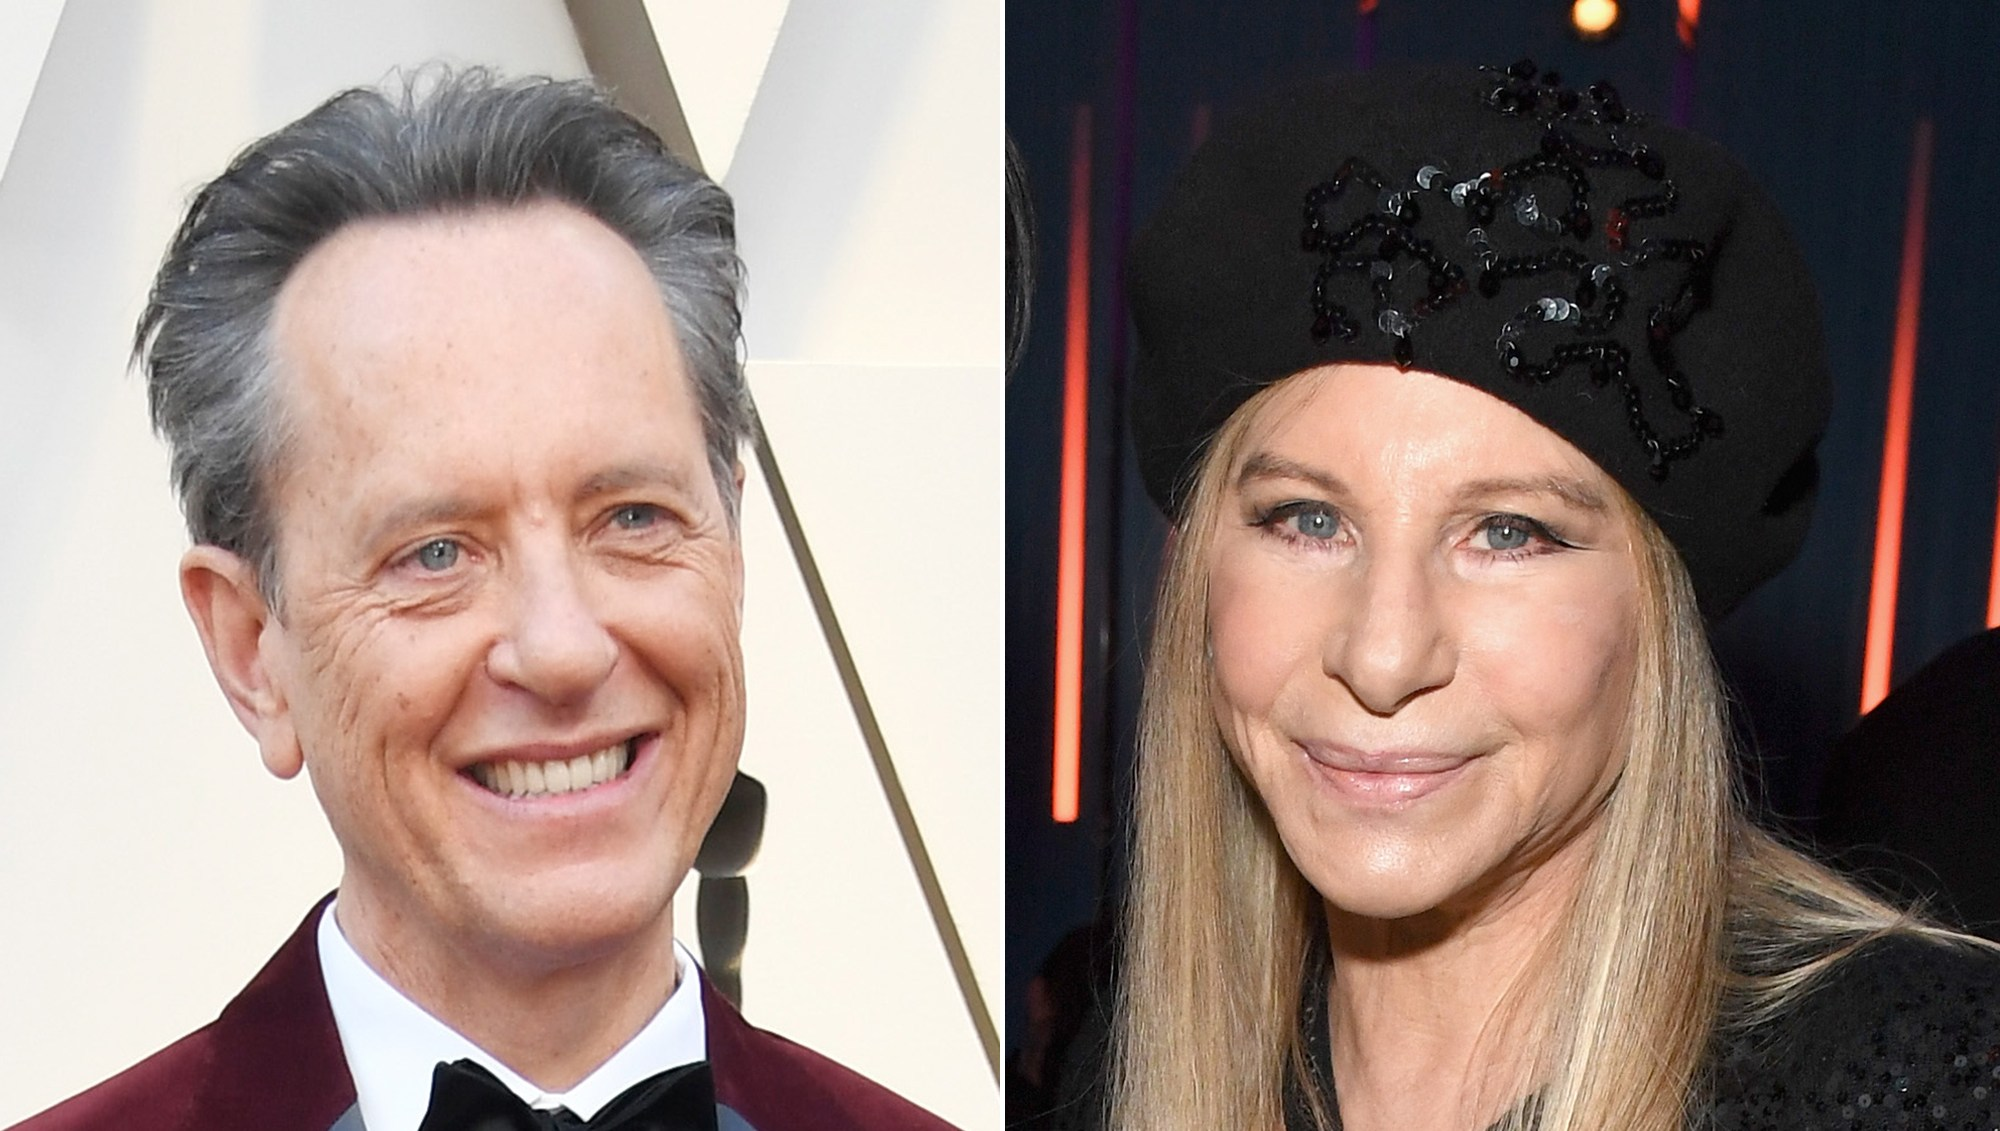 Richard E. Grant Finally Got His Barbra Streisand Moment at the 2019 Oscars